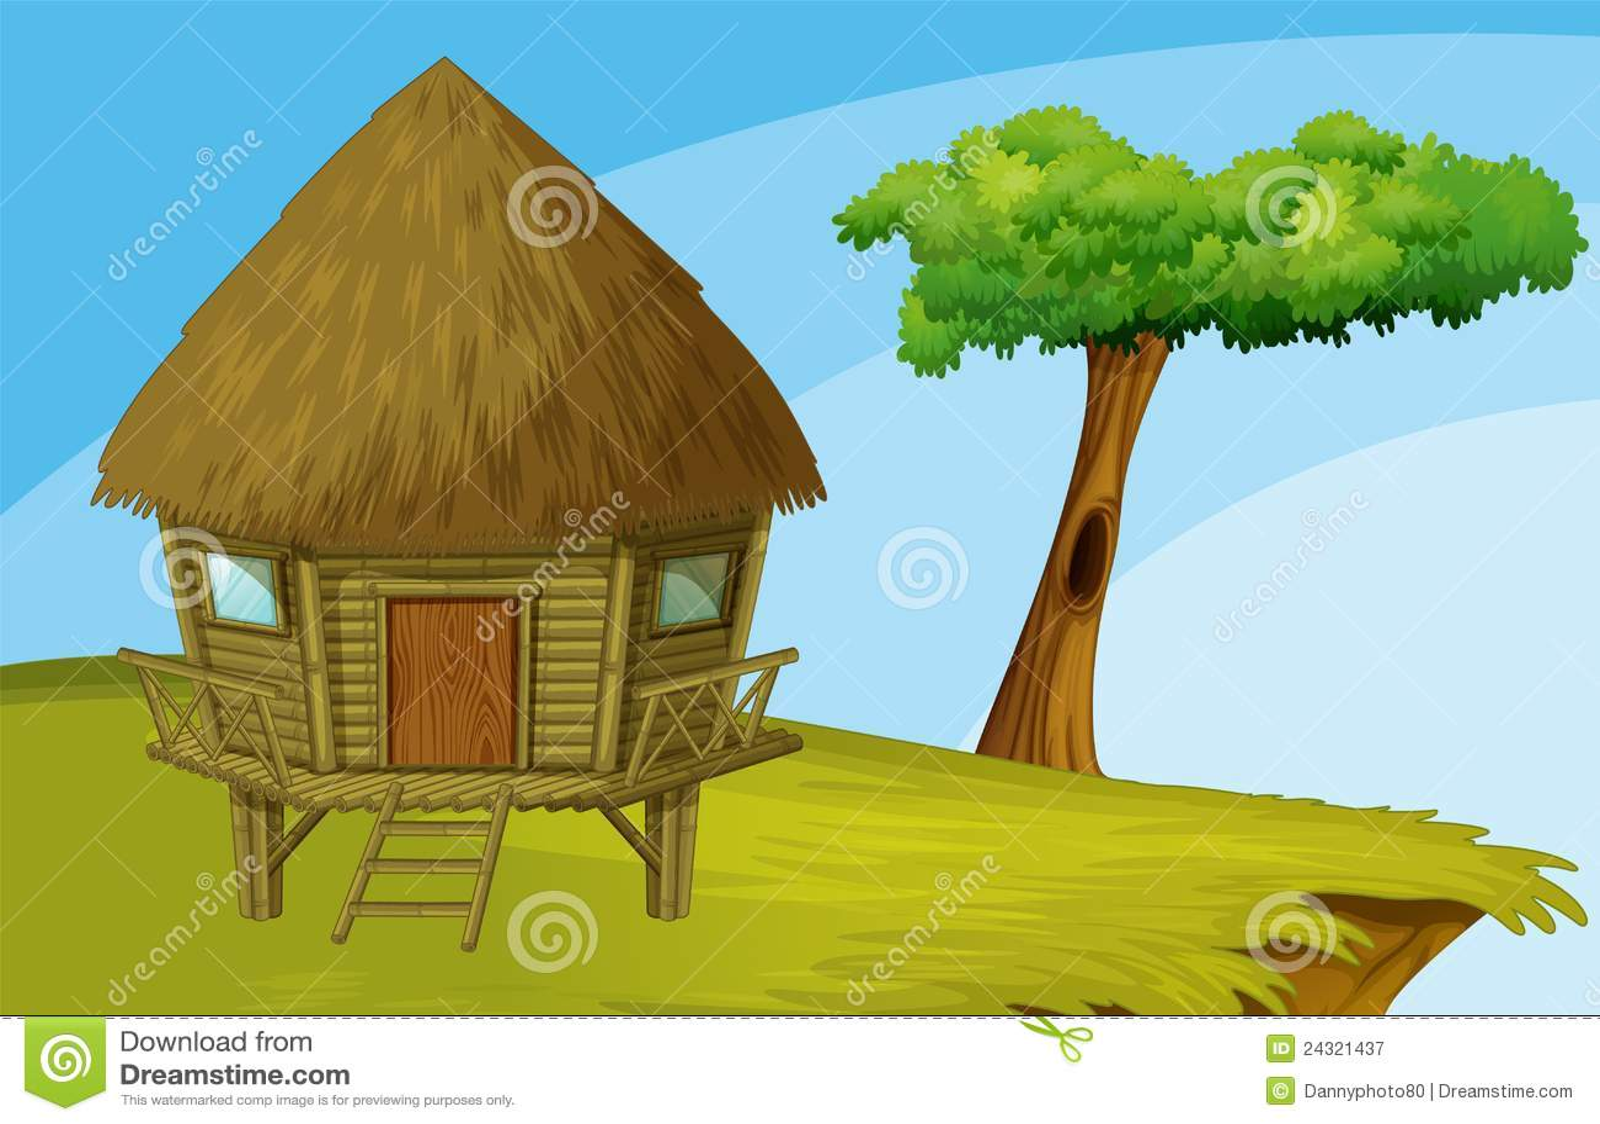 Cartoon Hut Royalty Free Stock Photography Image 24321437